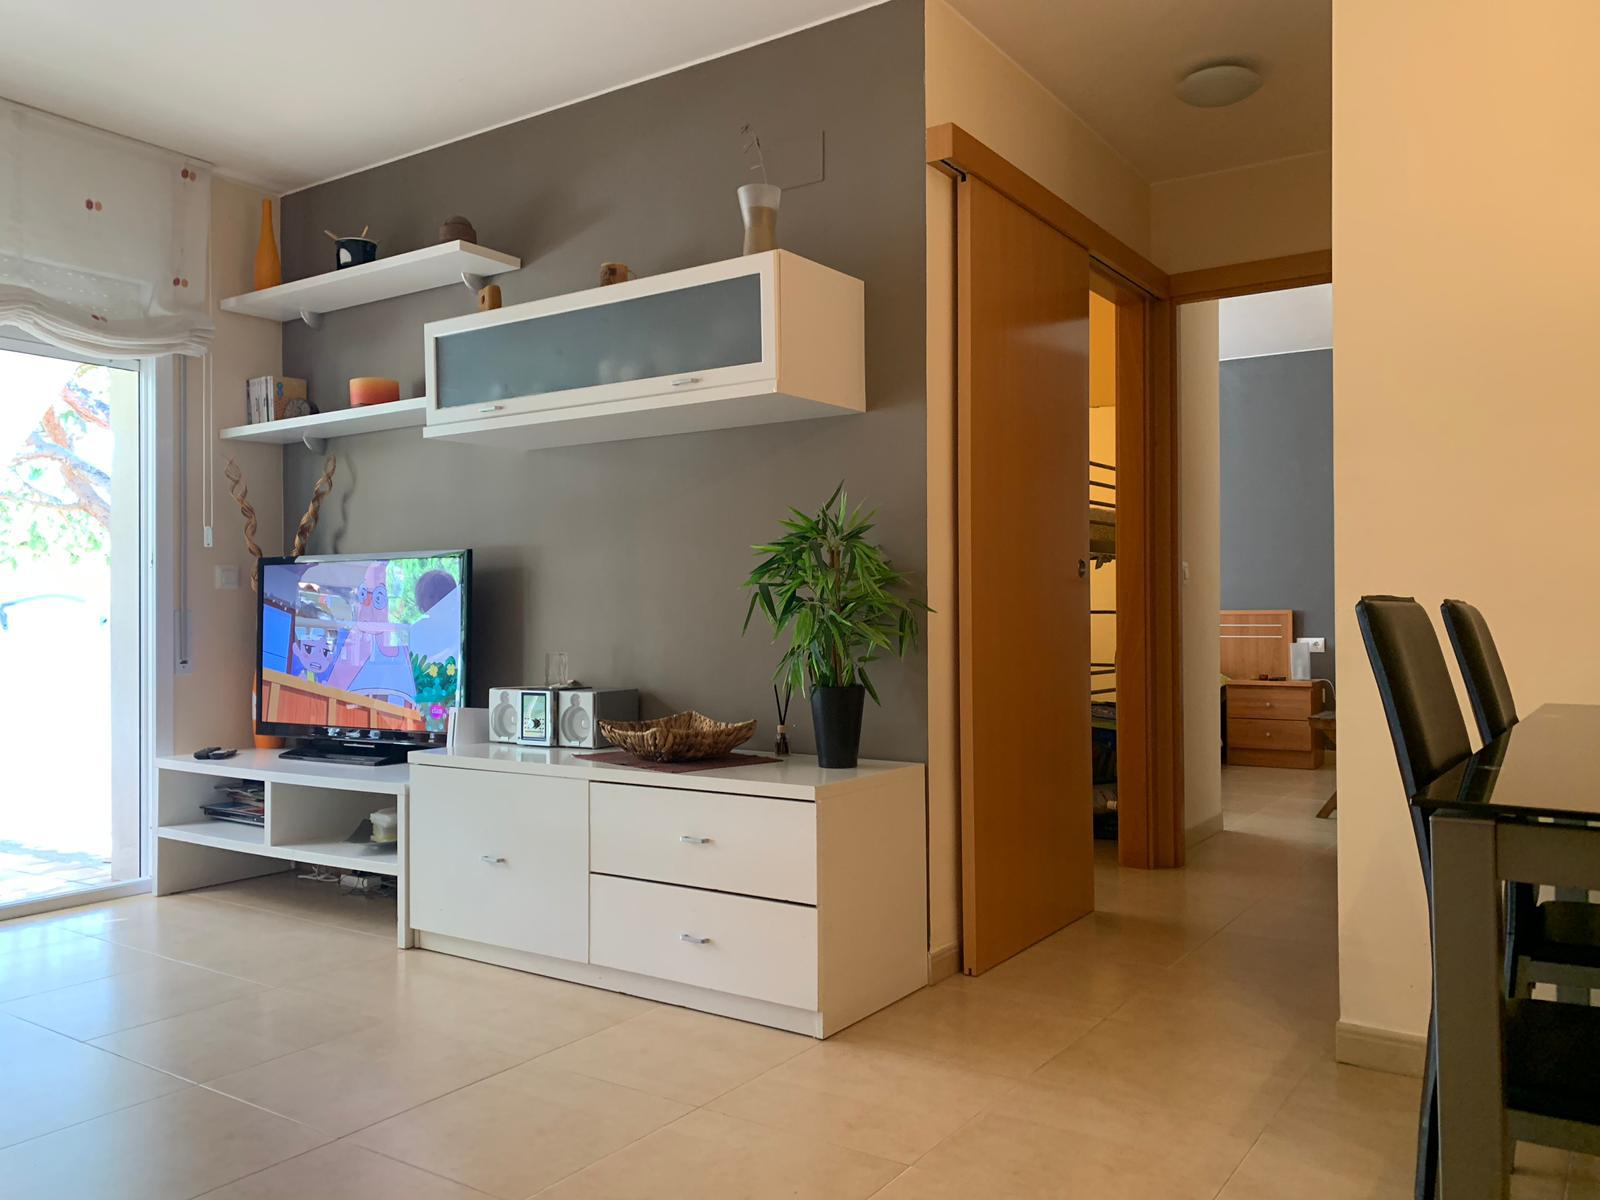 Alquiler Turístico Apartamento Palamós